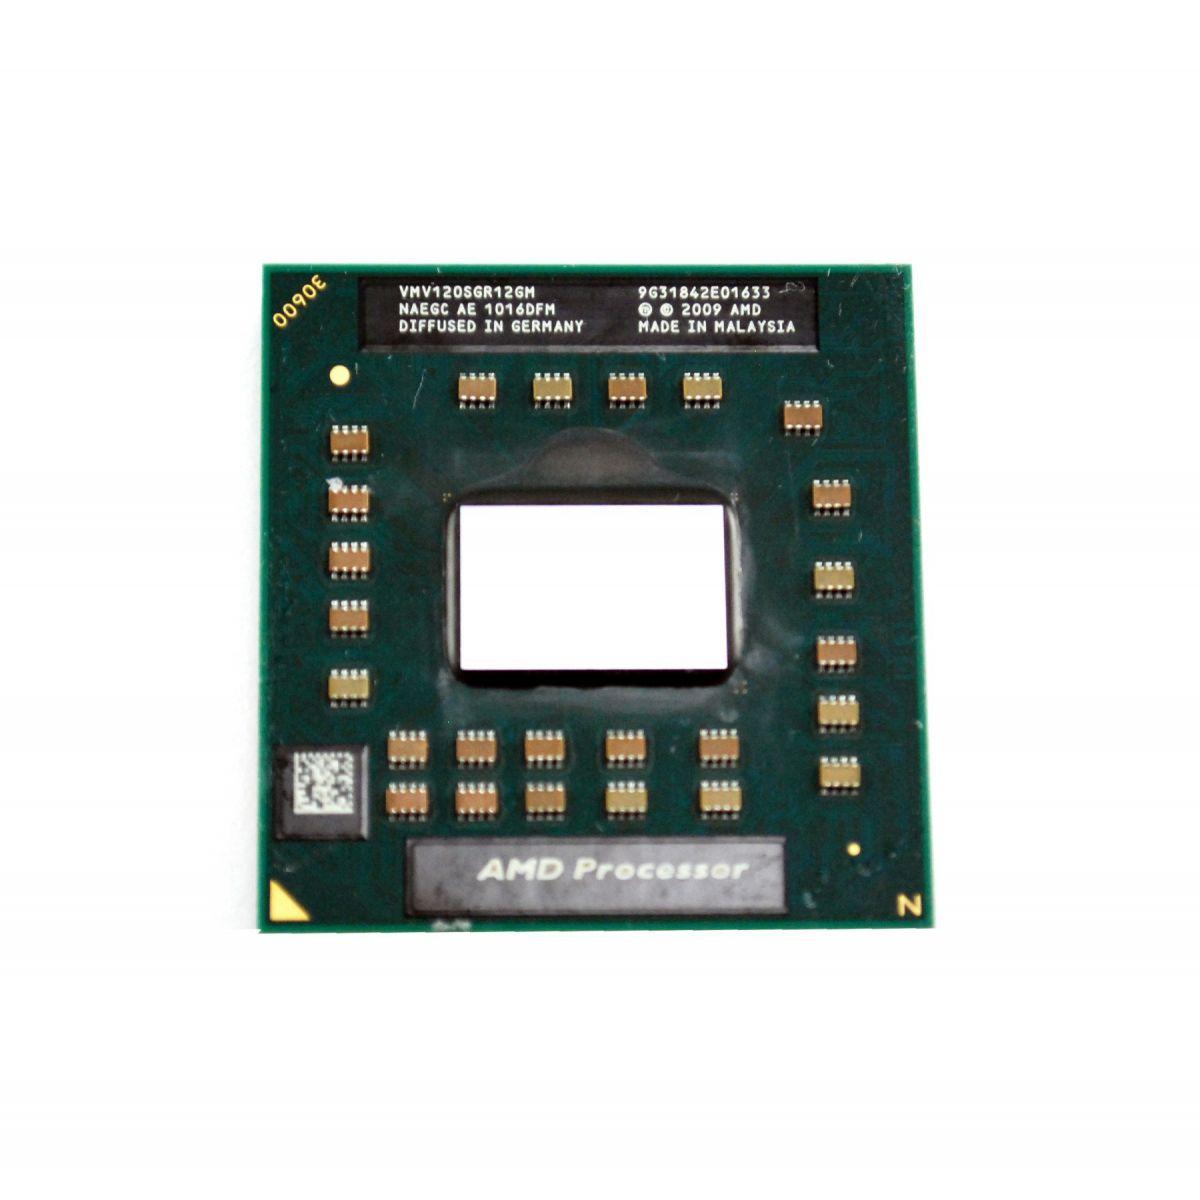 Processador Notebook AMD 2.2Ghz VMV120SGR12GM (semi novo)